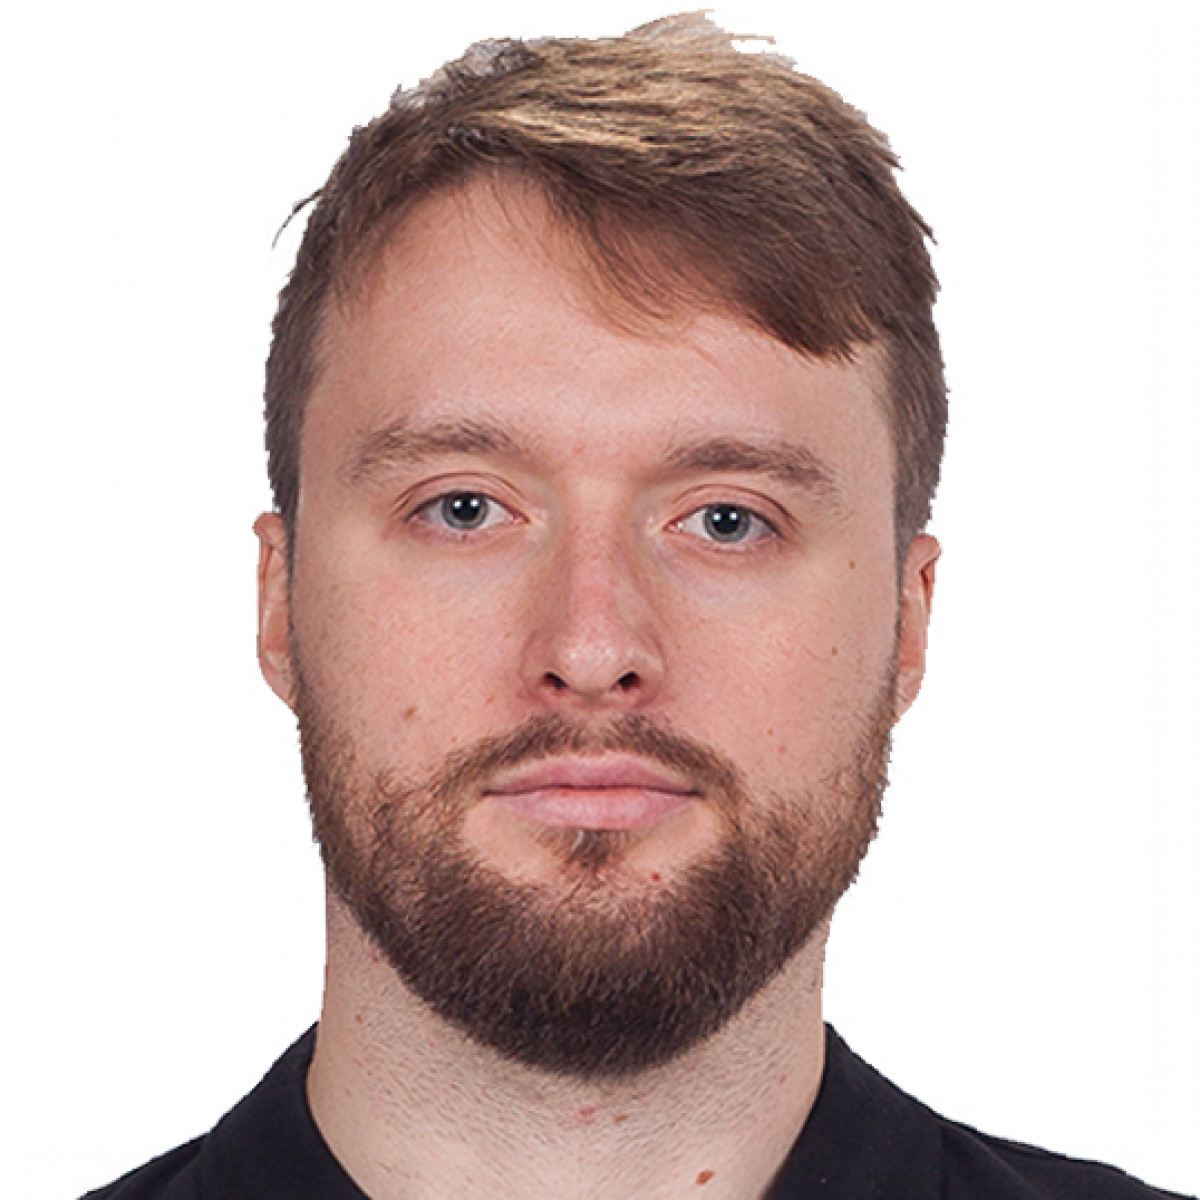 Filip Malgorzaciak